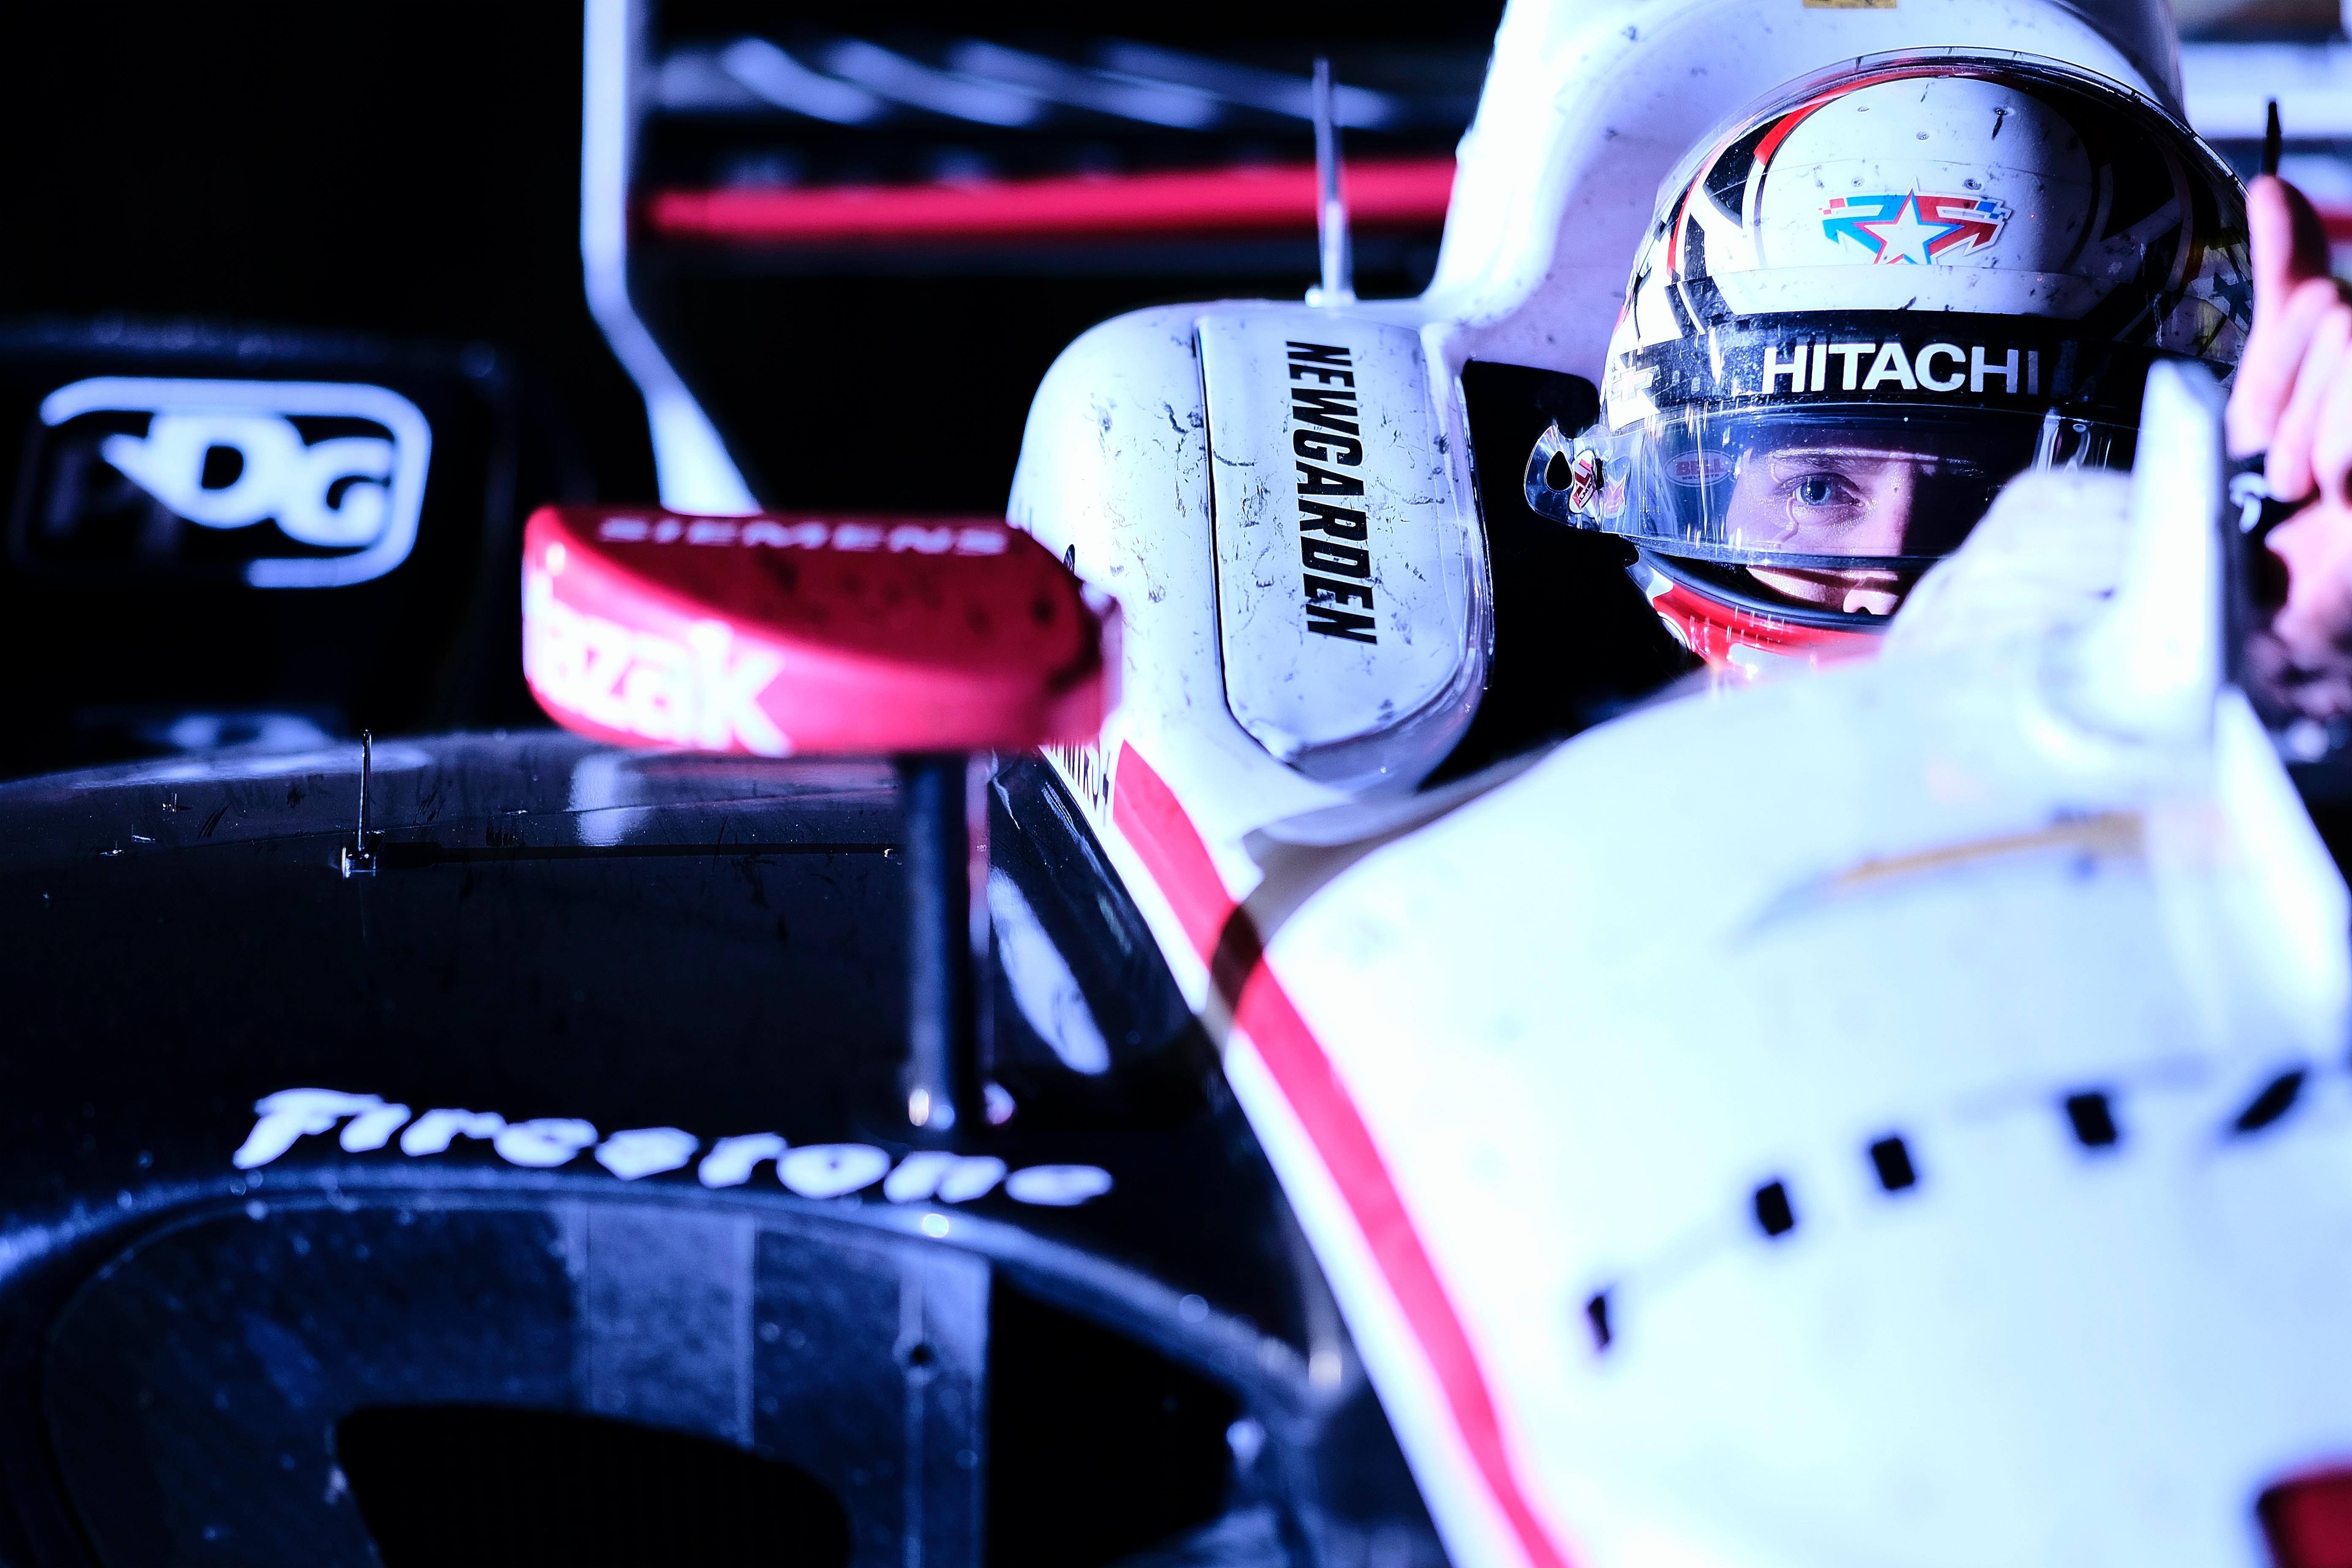 Josef Newgarden pulls into victory lane at Iowa Speedway. © [Jamie Sheldrick/ Spacesuit Media]